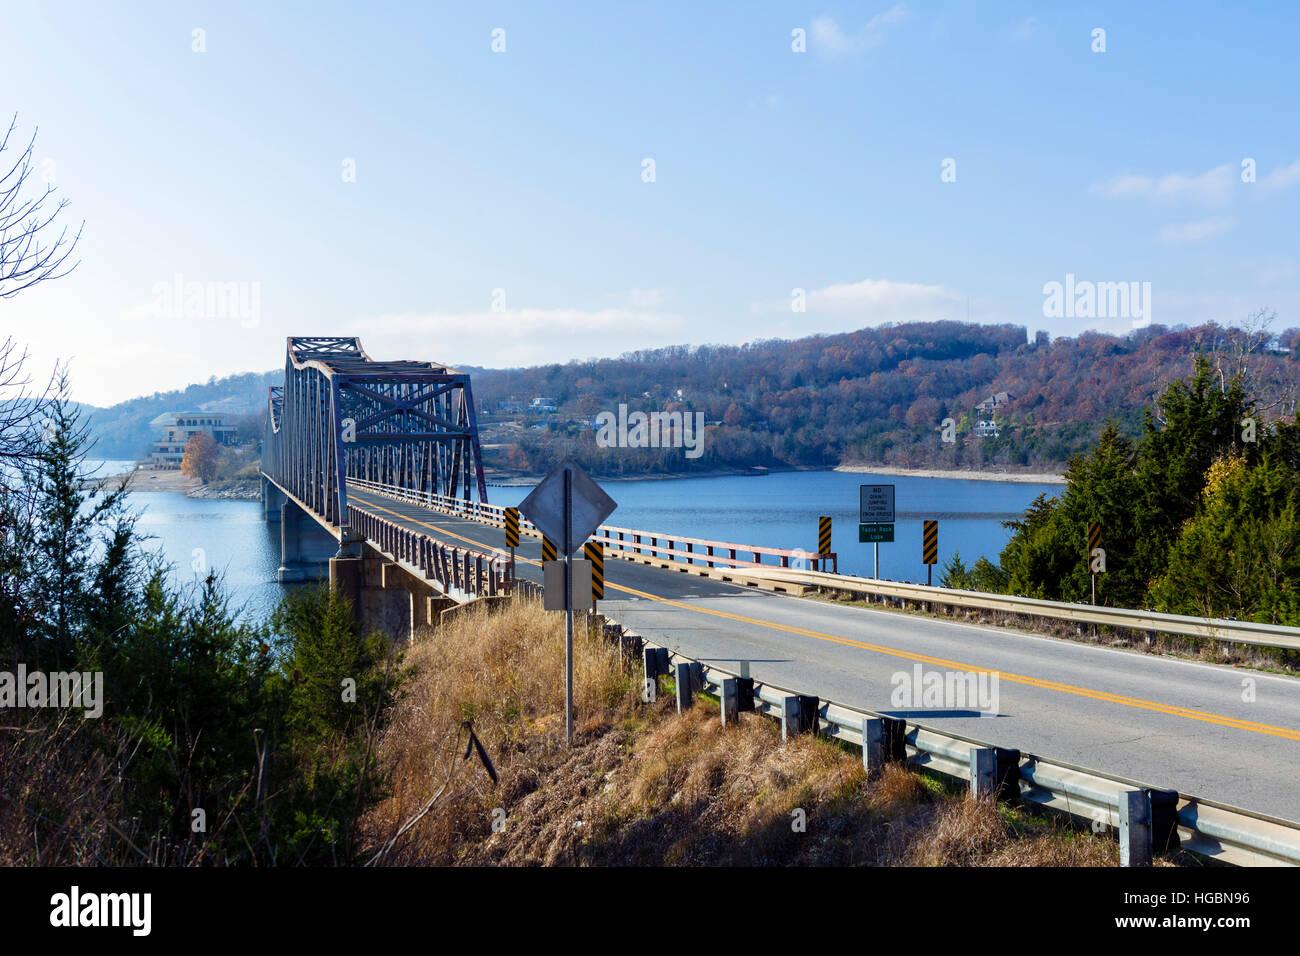 Ponte sul MO-86 attraversando Table Rock Lake, Ridgedale, Ozarks, Missouri, Stati Uniti d'America Immagini Stock